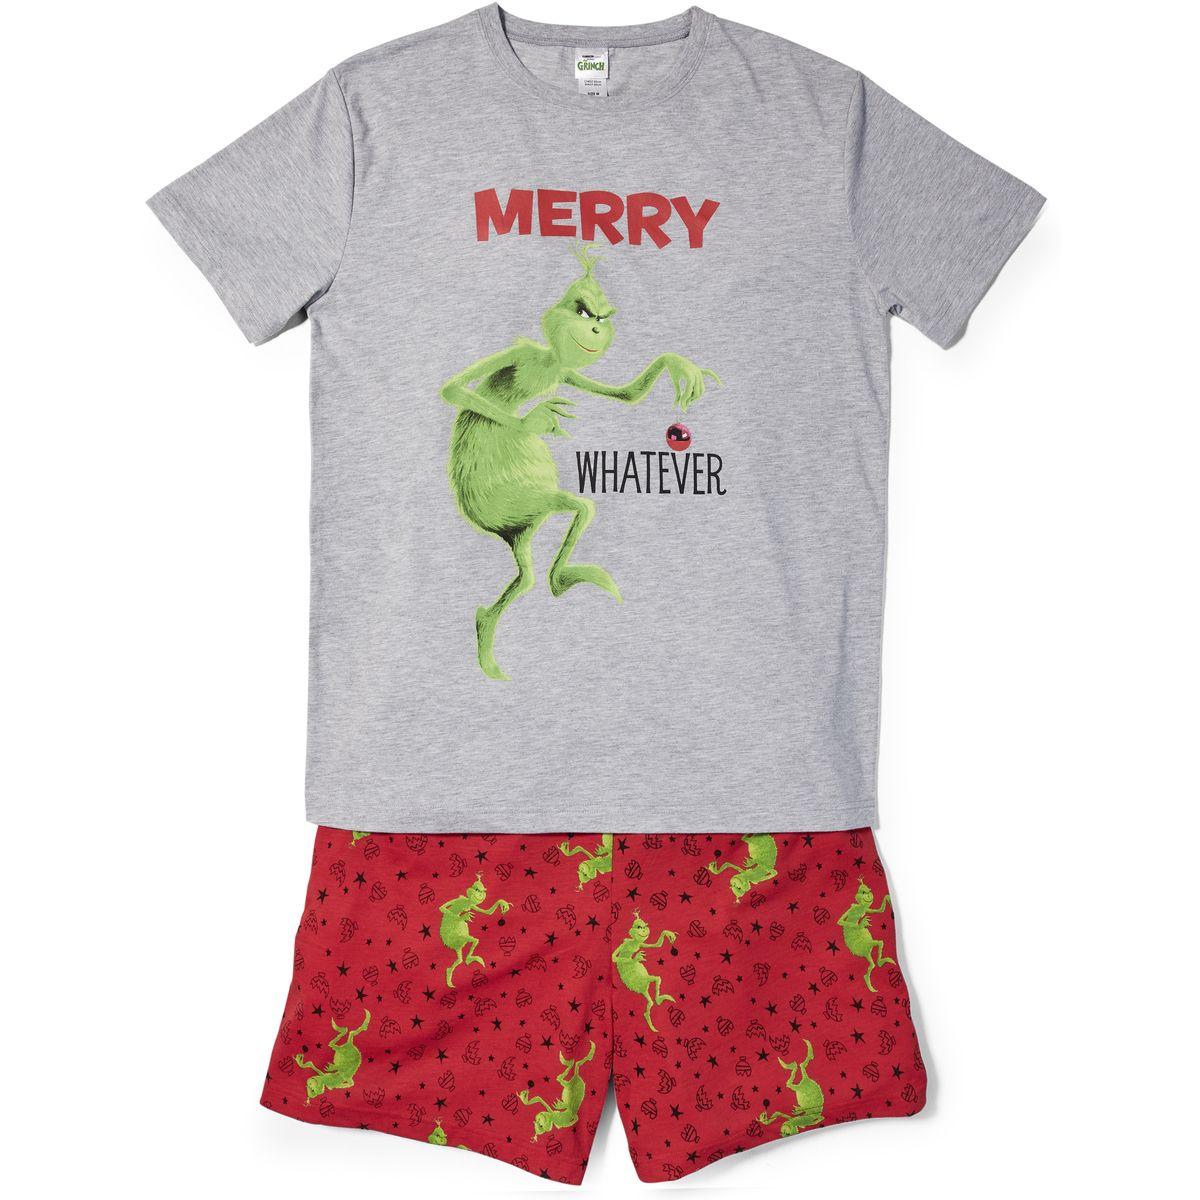 The Grinch Men's Christmas Pyjama Set Grey BIG W